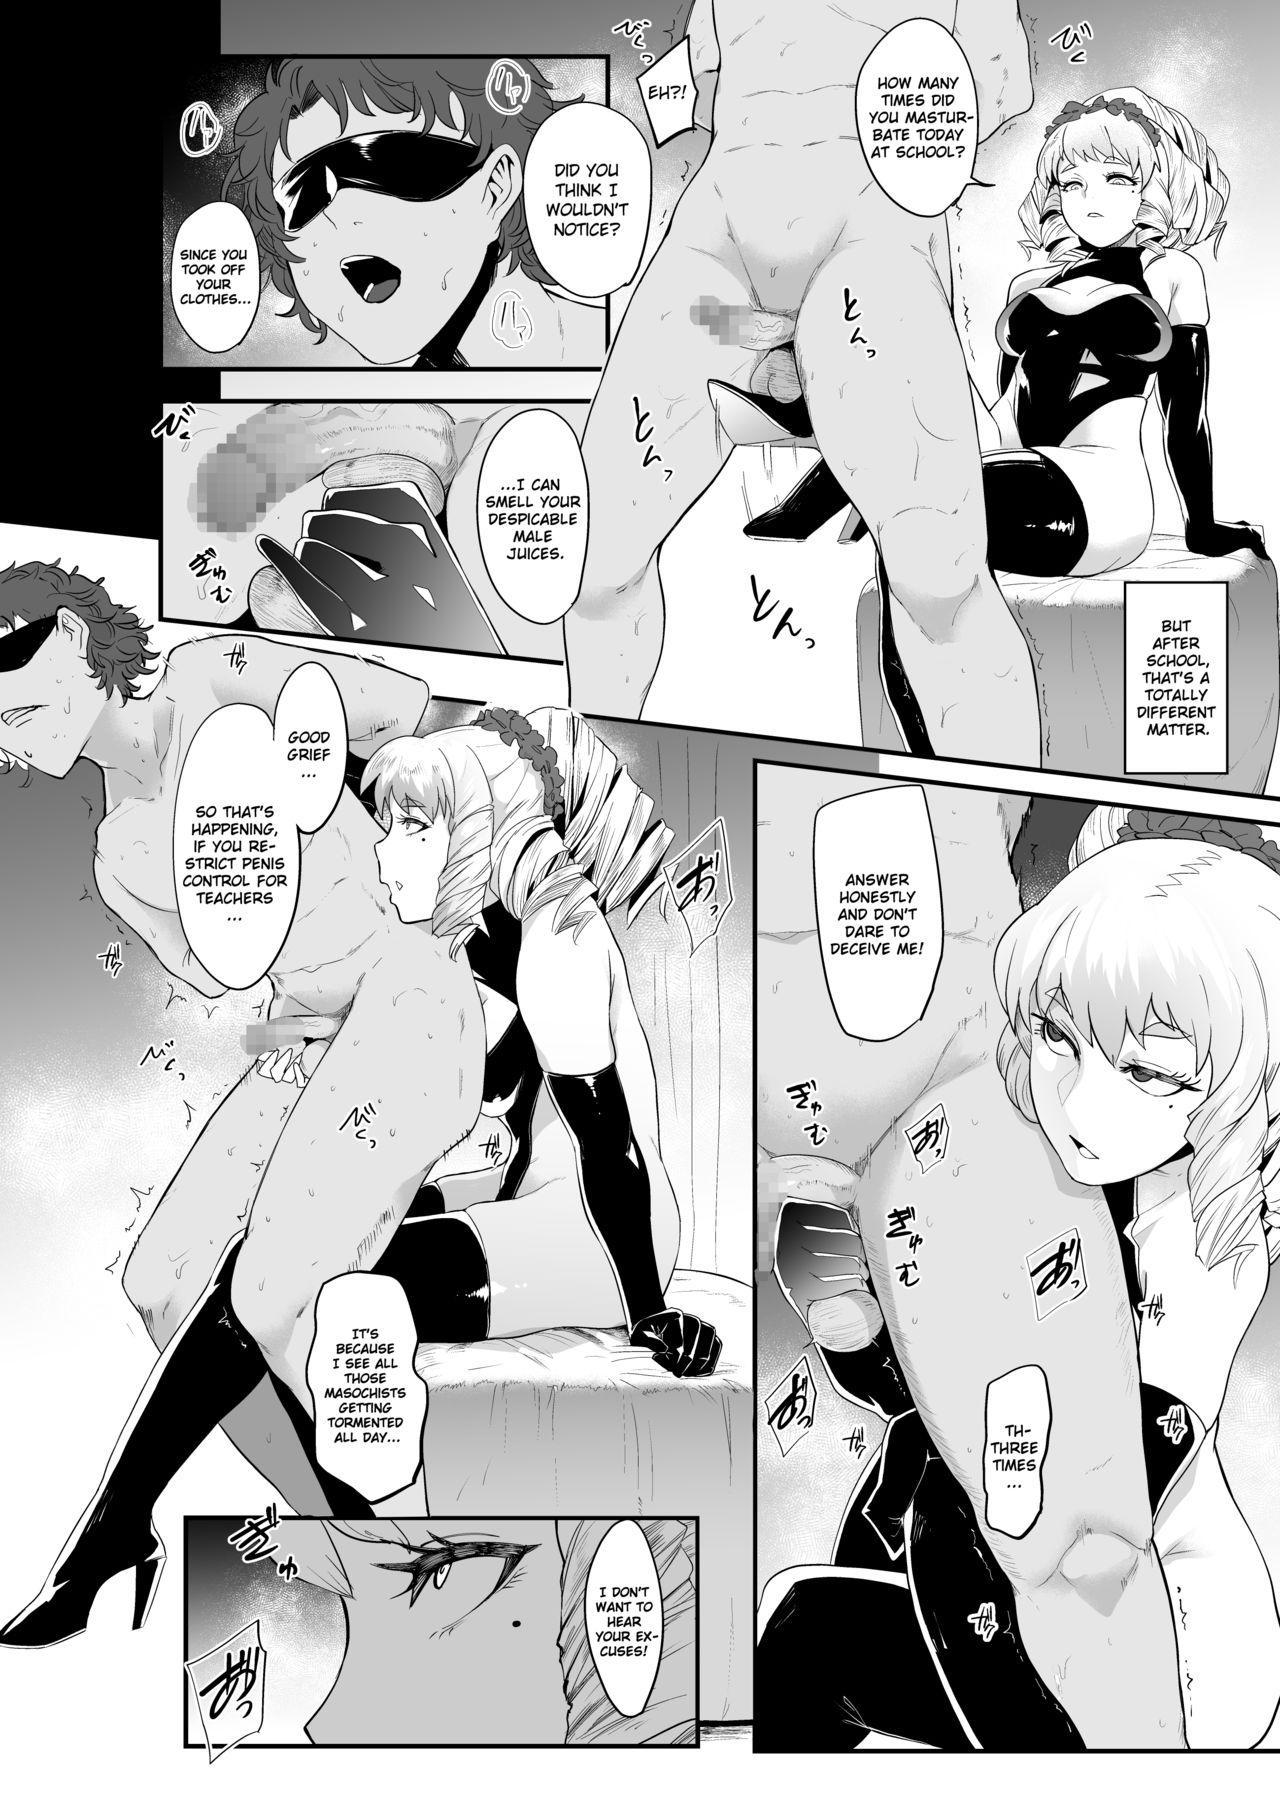 [SOUND MILK (Otochichi)] S Gakuen ~Ojou-sama-tachi no Maso Otoko Choukyou~ | S Academy ~Young Ladies Training Masochistic Men~ [English][QuarantineScans] 14